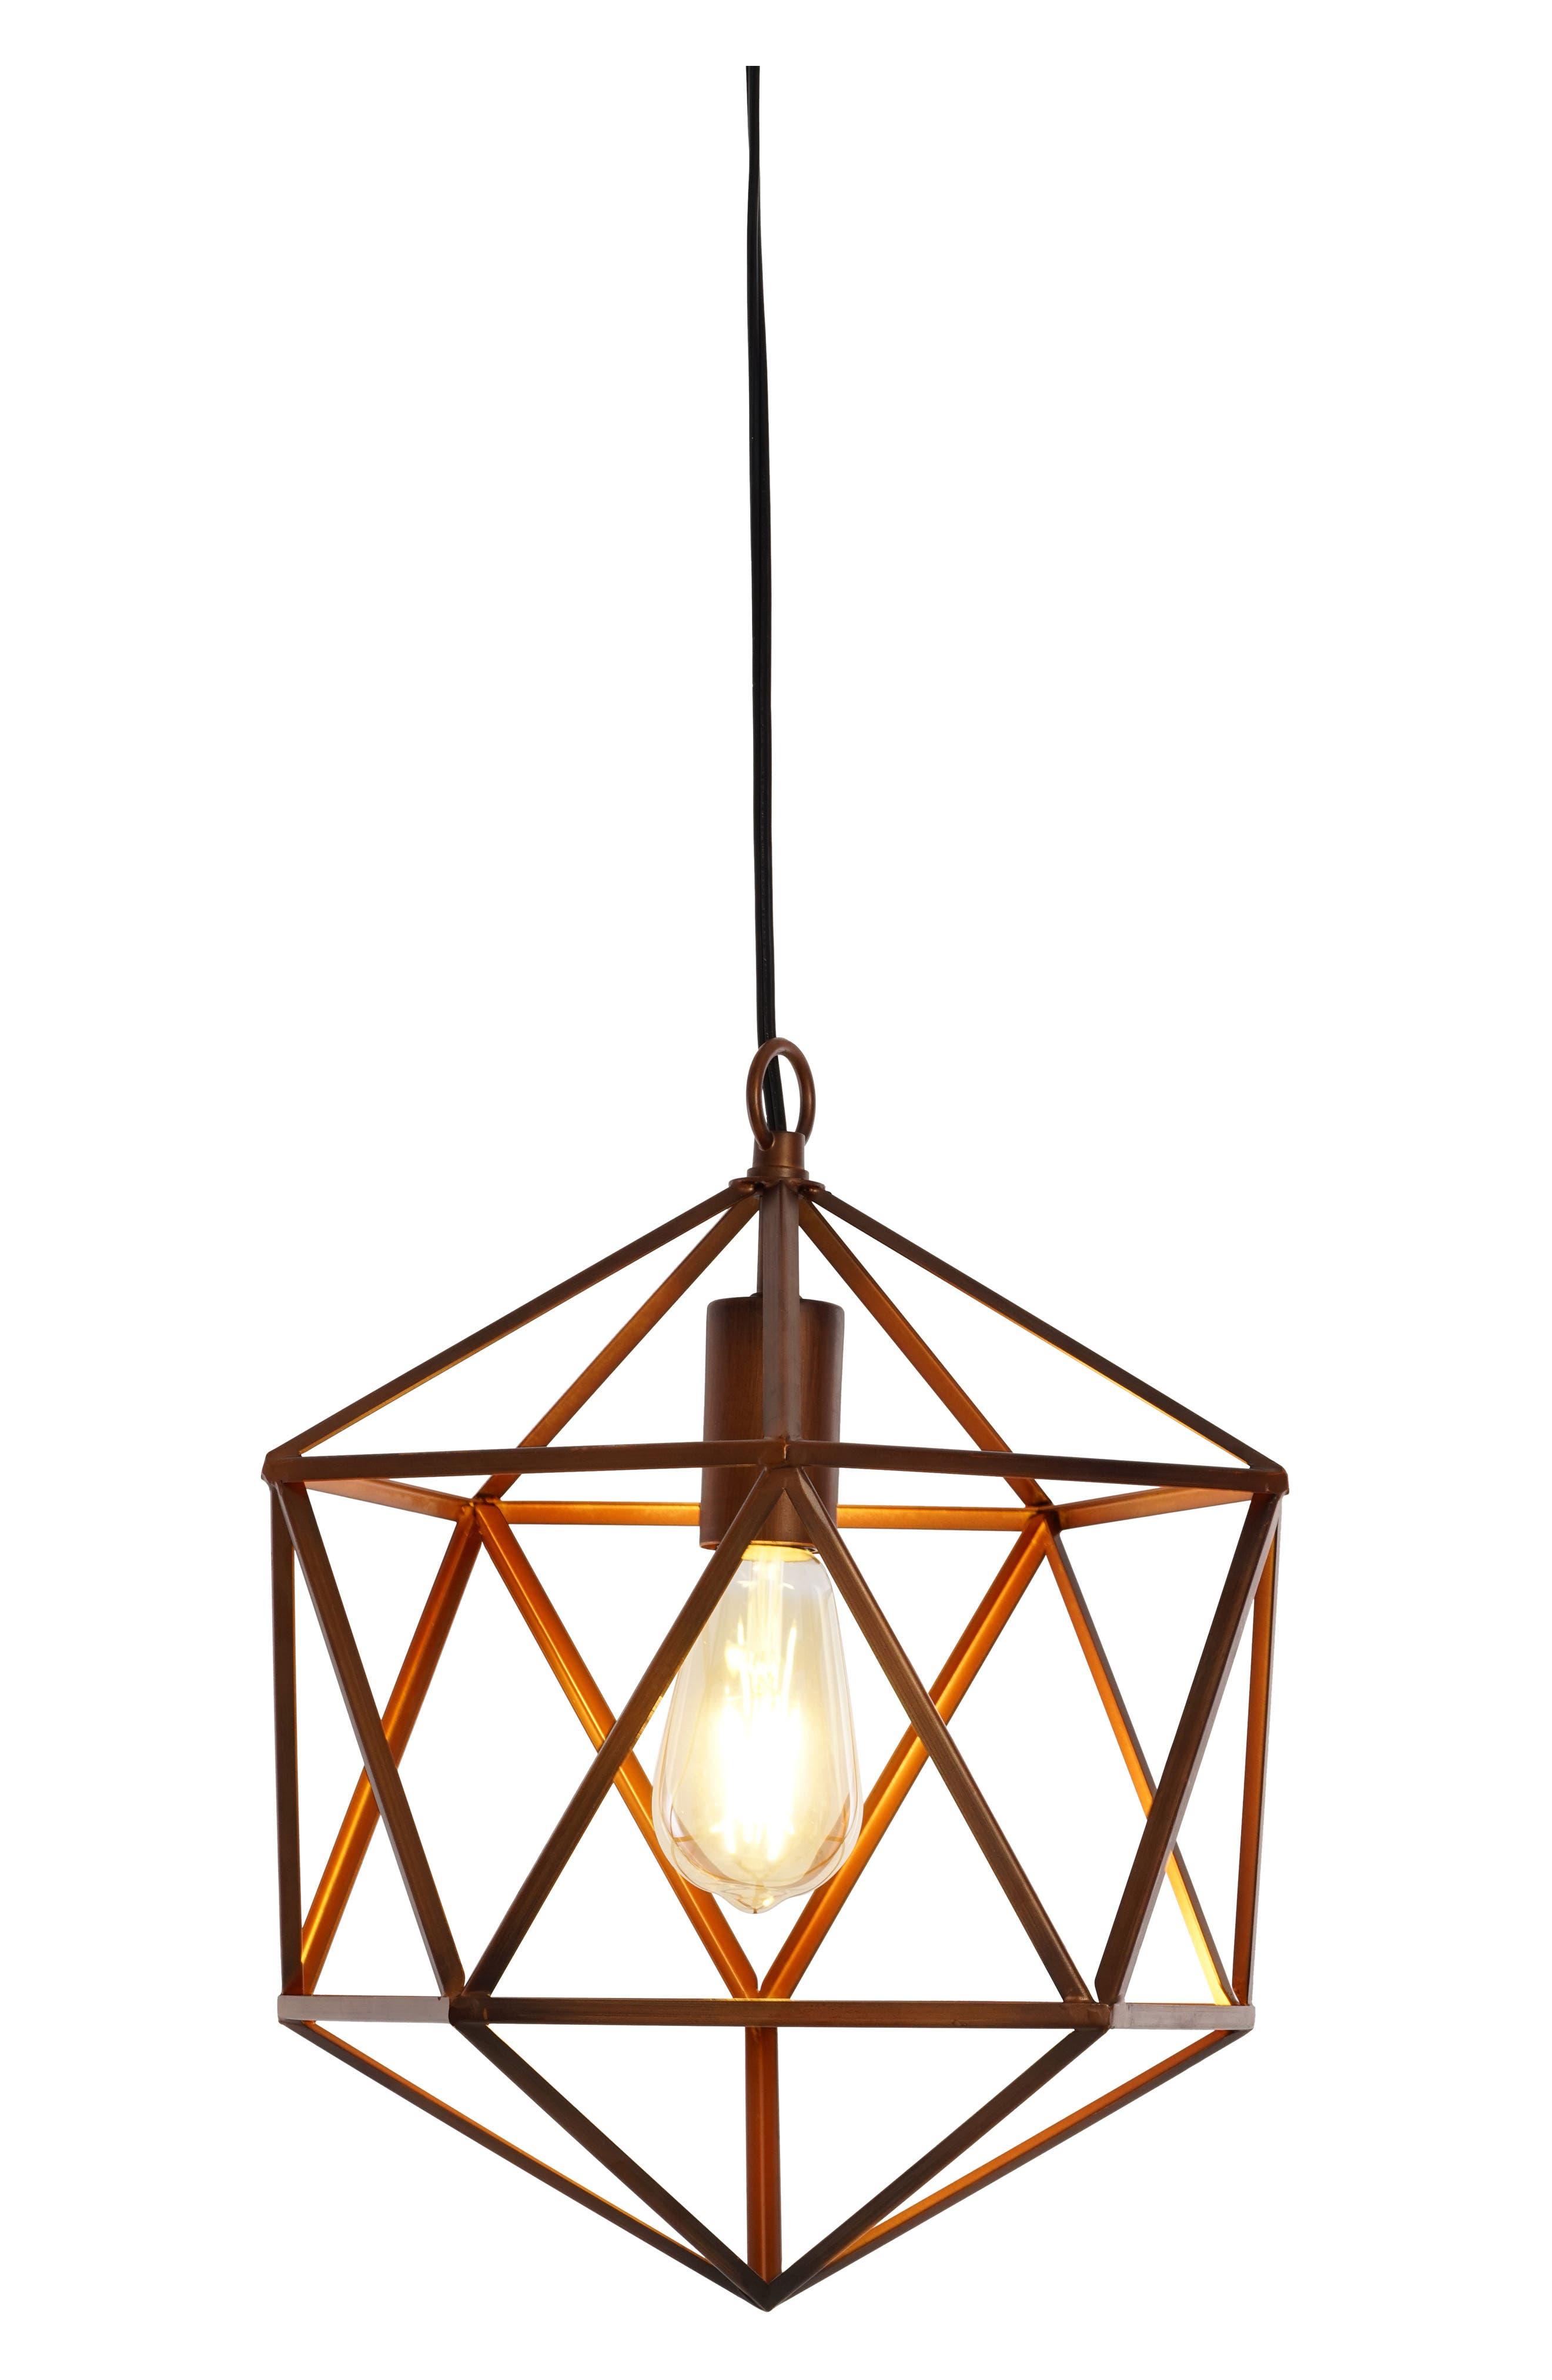 JAlexander Geometric Pendant Light